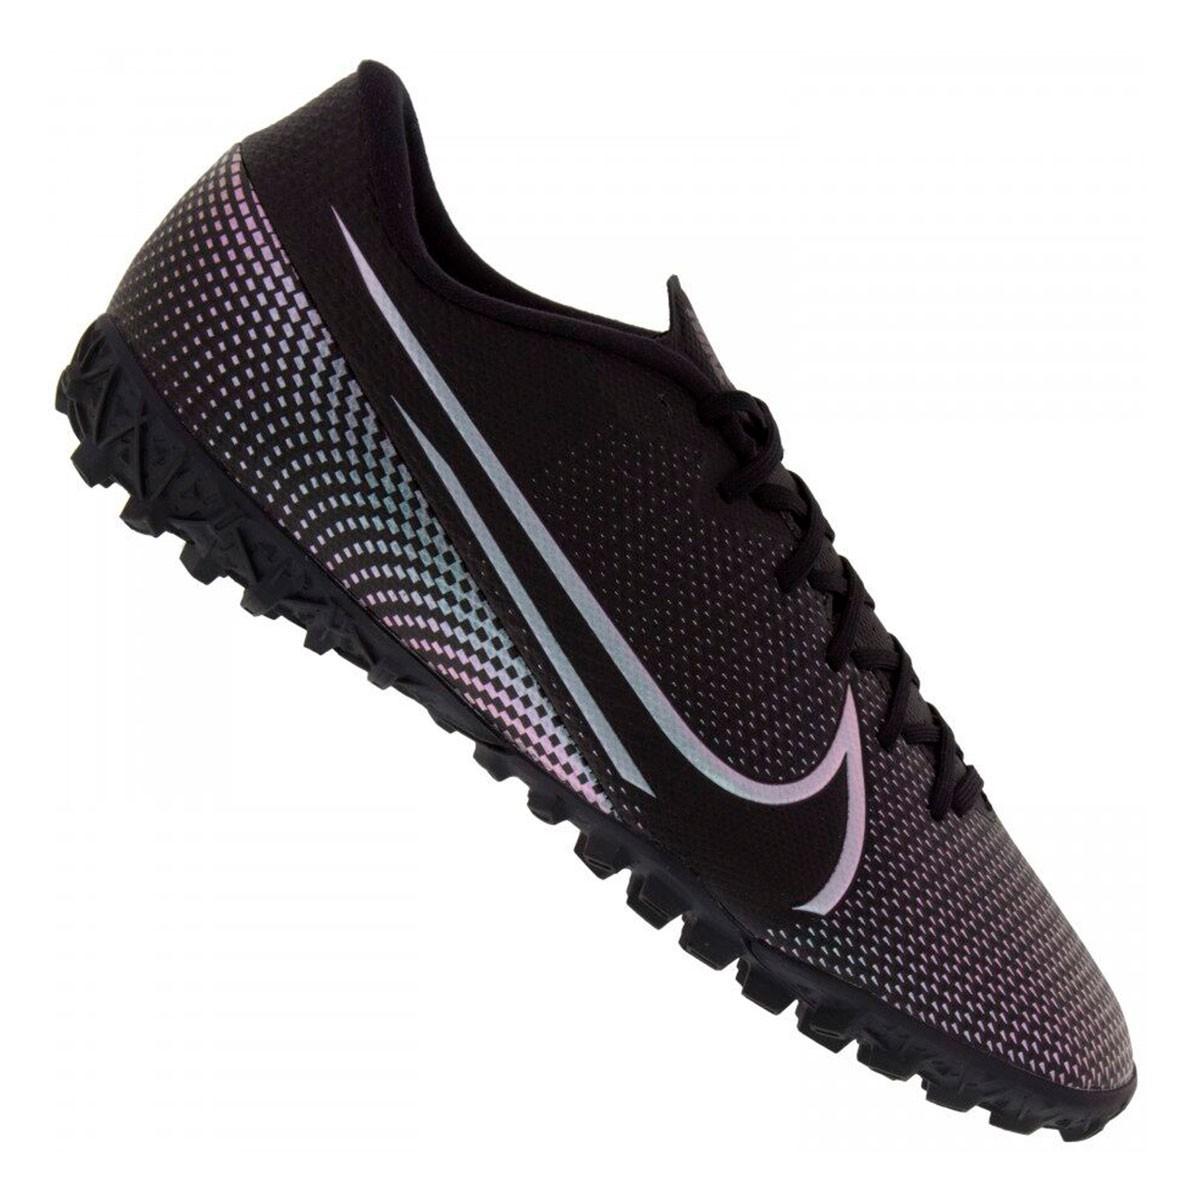 Chuteira Society Nike Mercurial Vapor 13 Academy